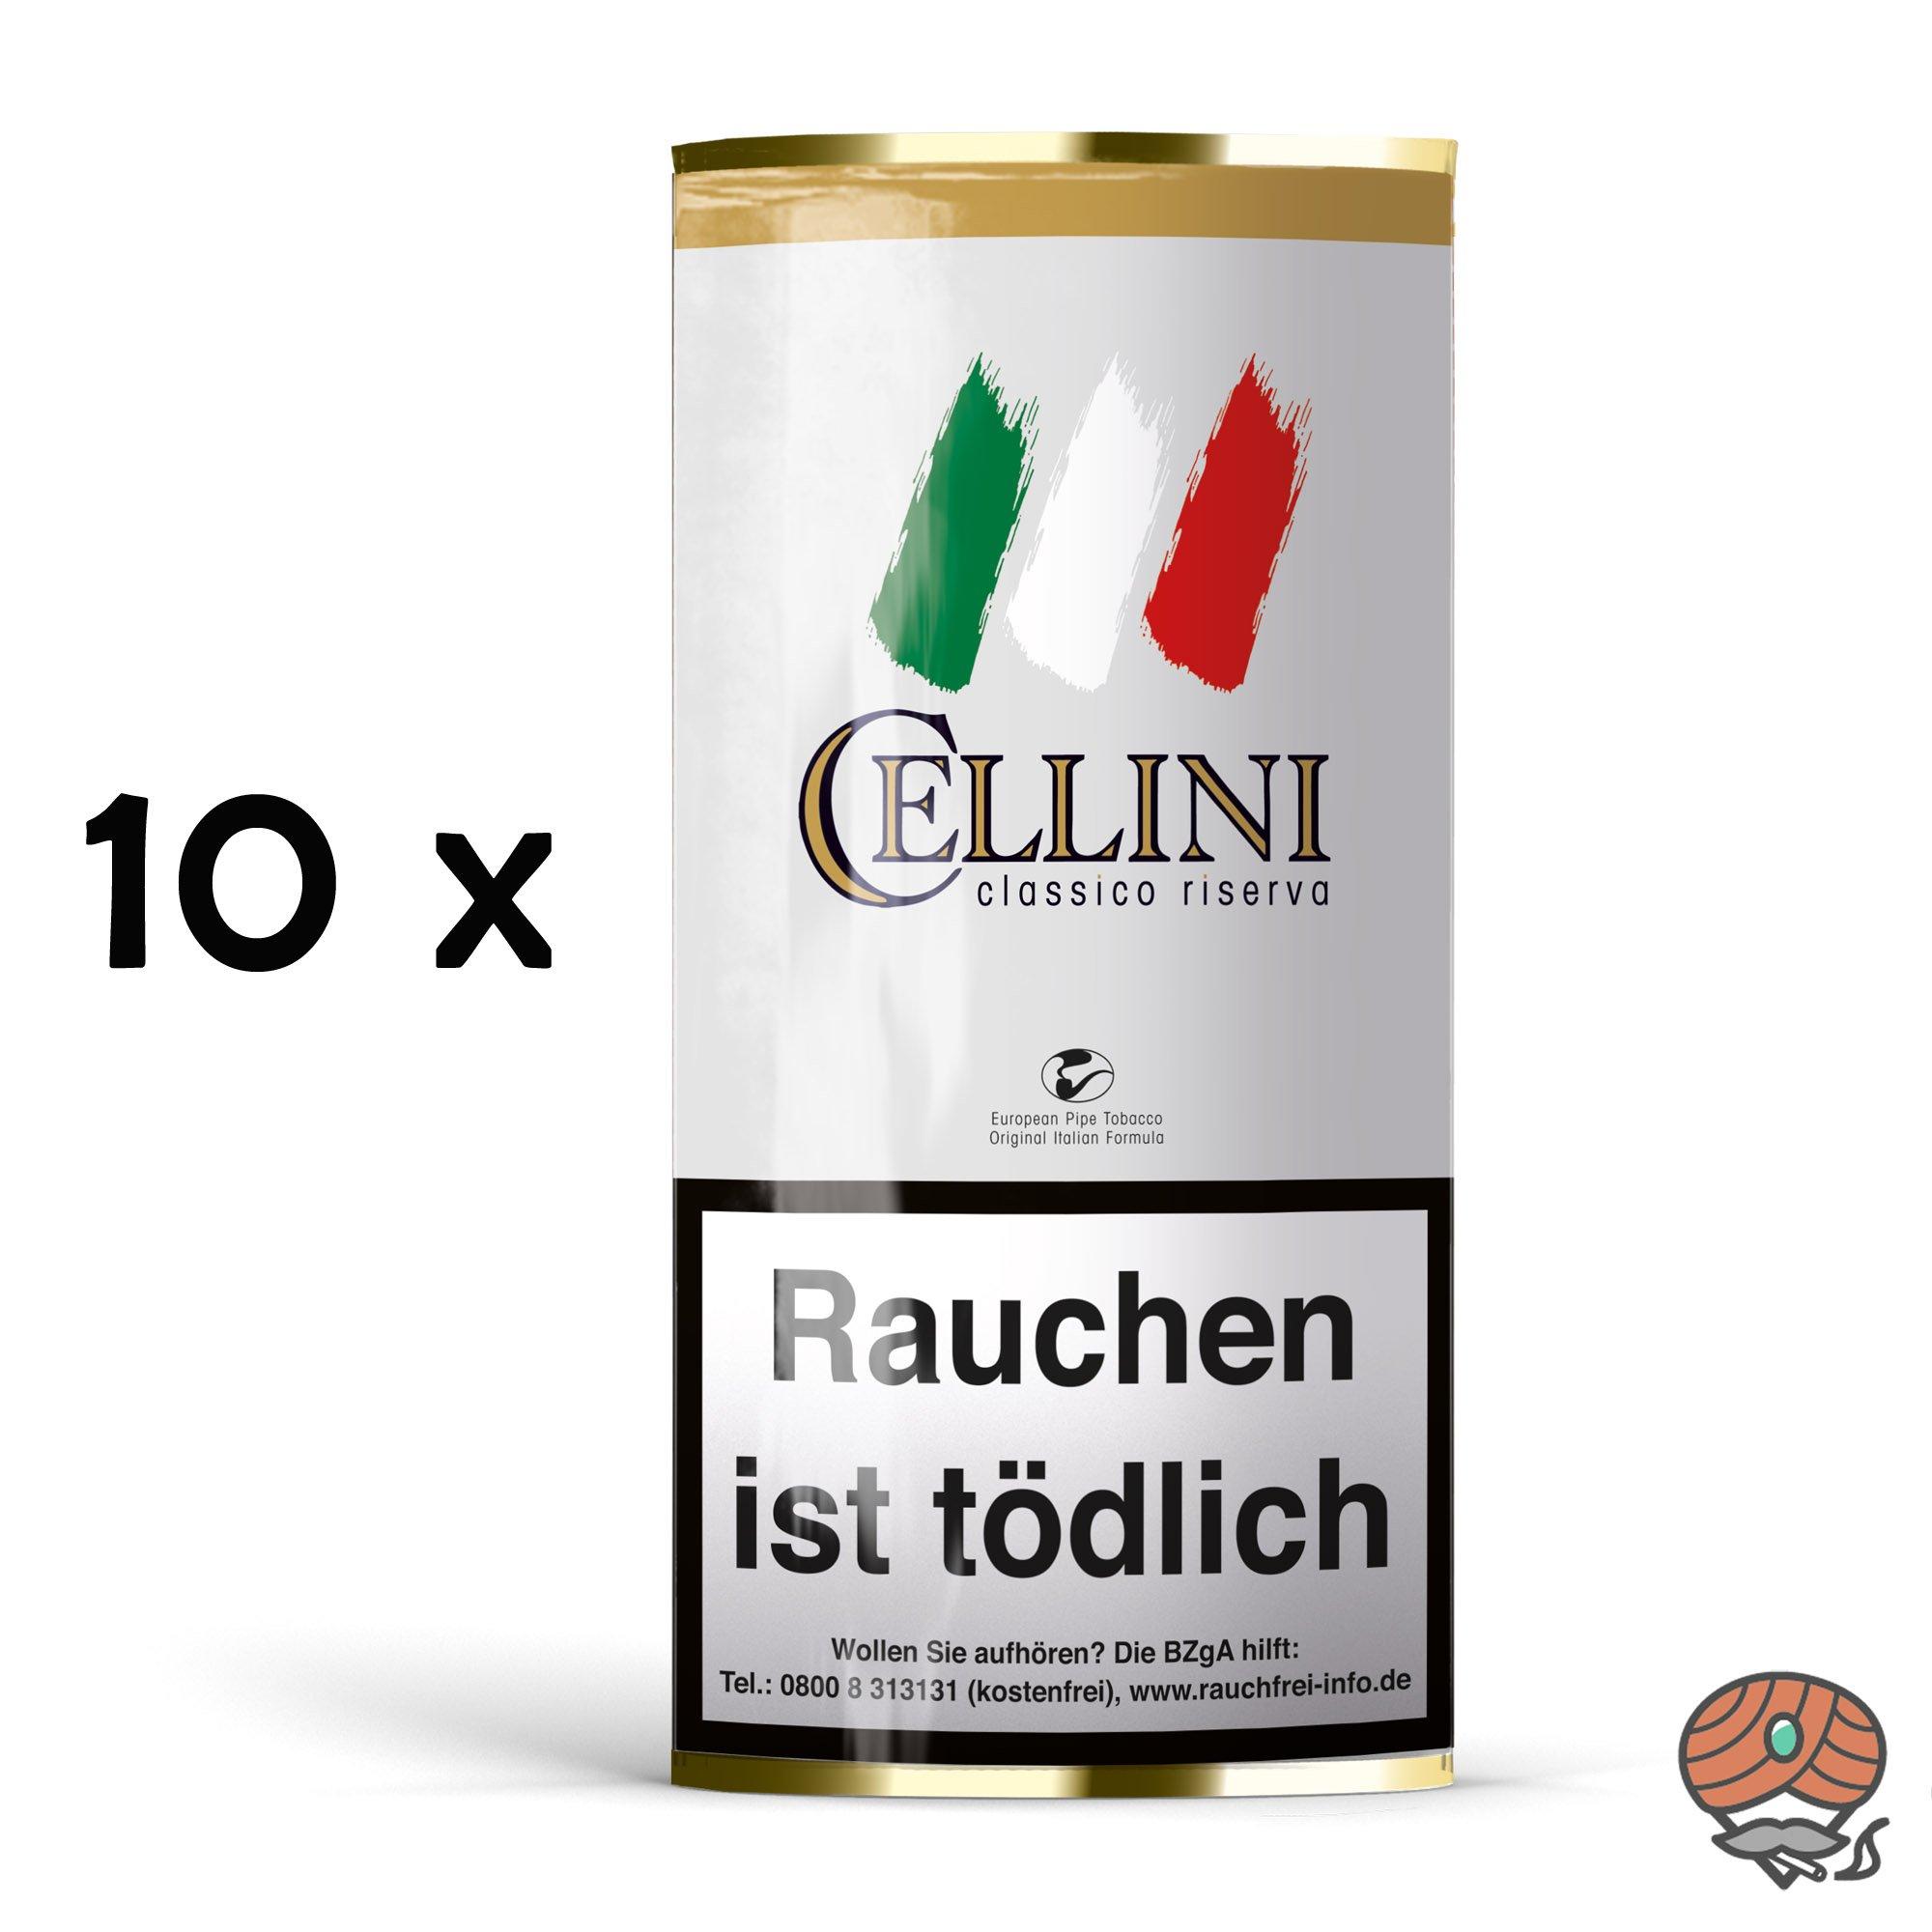 10 Beutel Cellini Classico Riserva Pfeifentabak à 50g